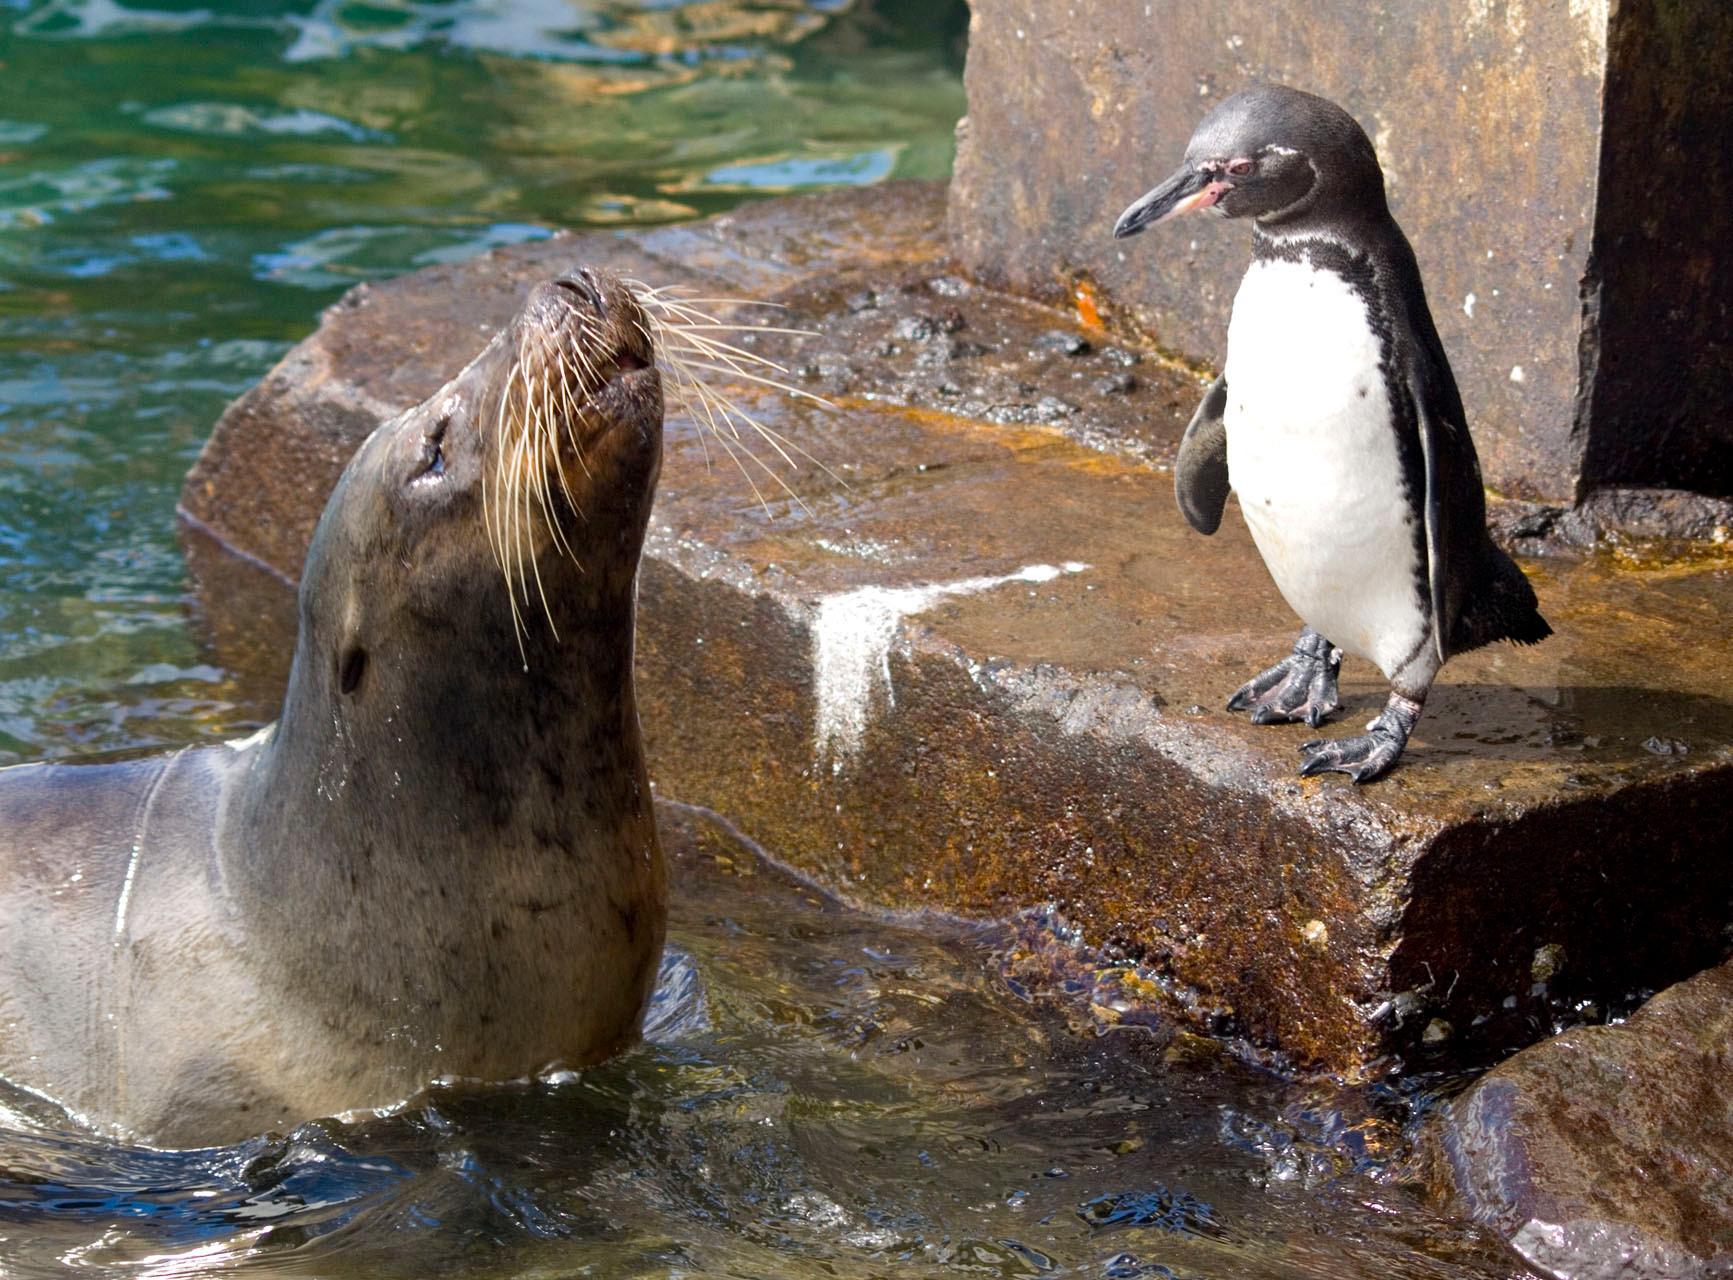 Galapagos penguin [Galapagos, Ecuador, 2009]